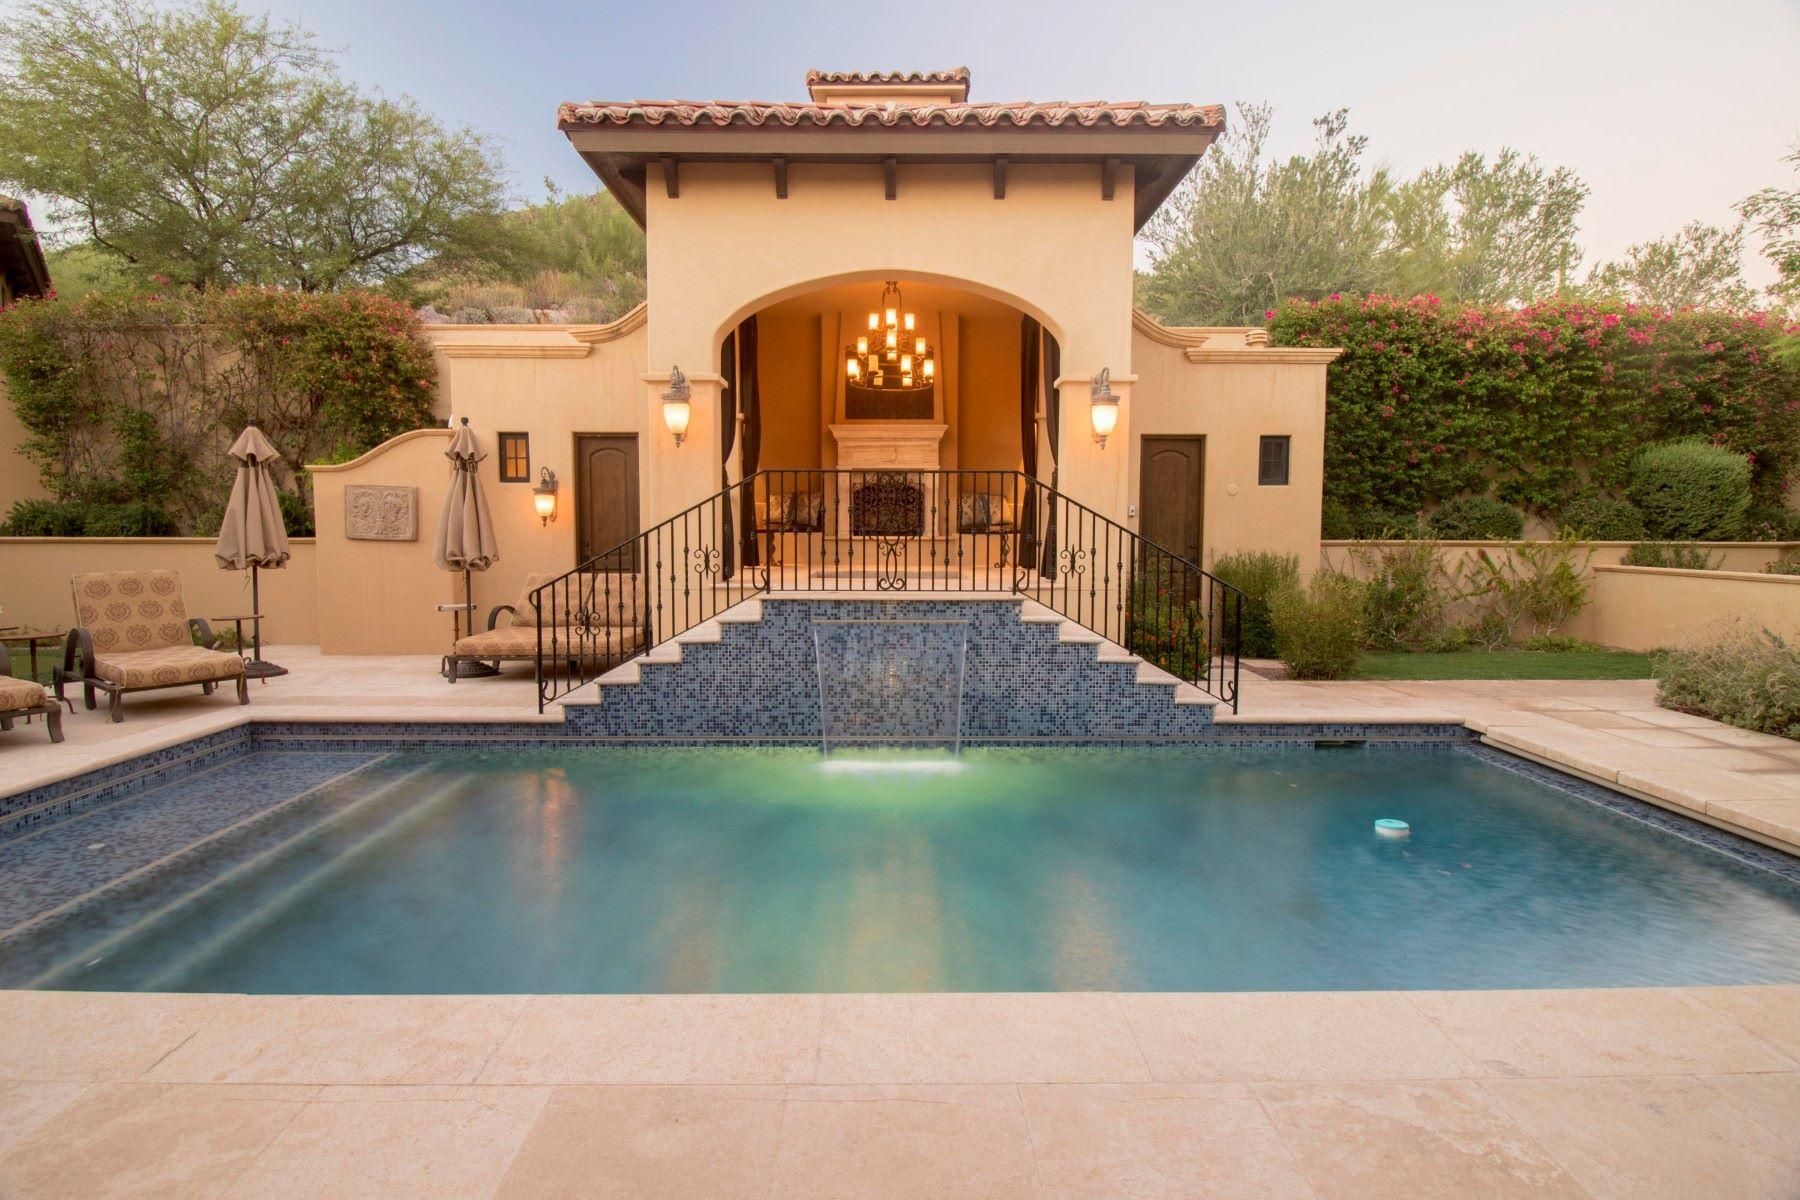 Property for Sale at Silverleaf 20759 N 102ND ST, Scottsdale, Arizona 85255 United States